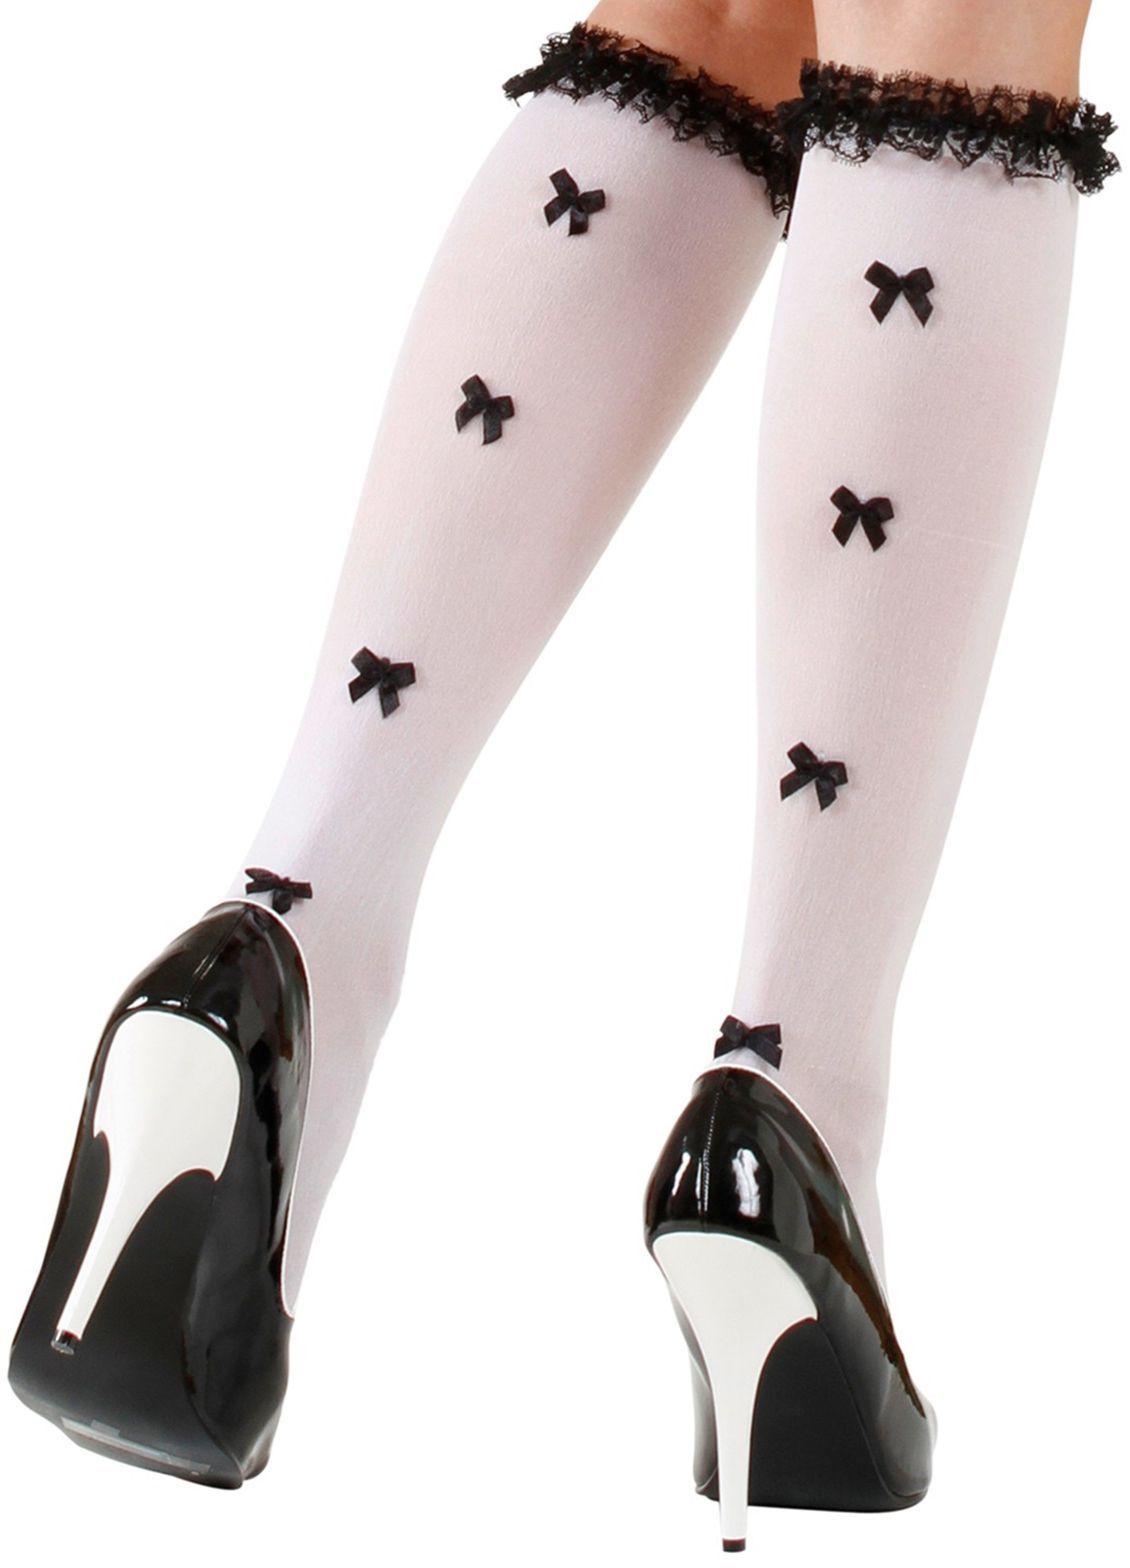 Witte kousen met zwarte strikjes